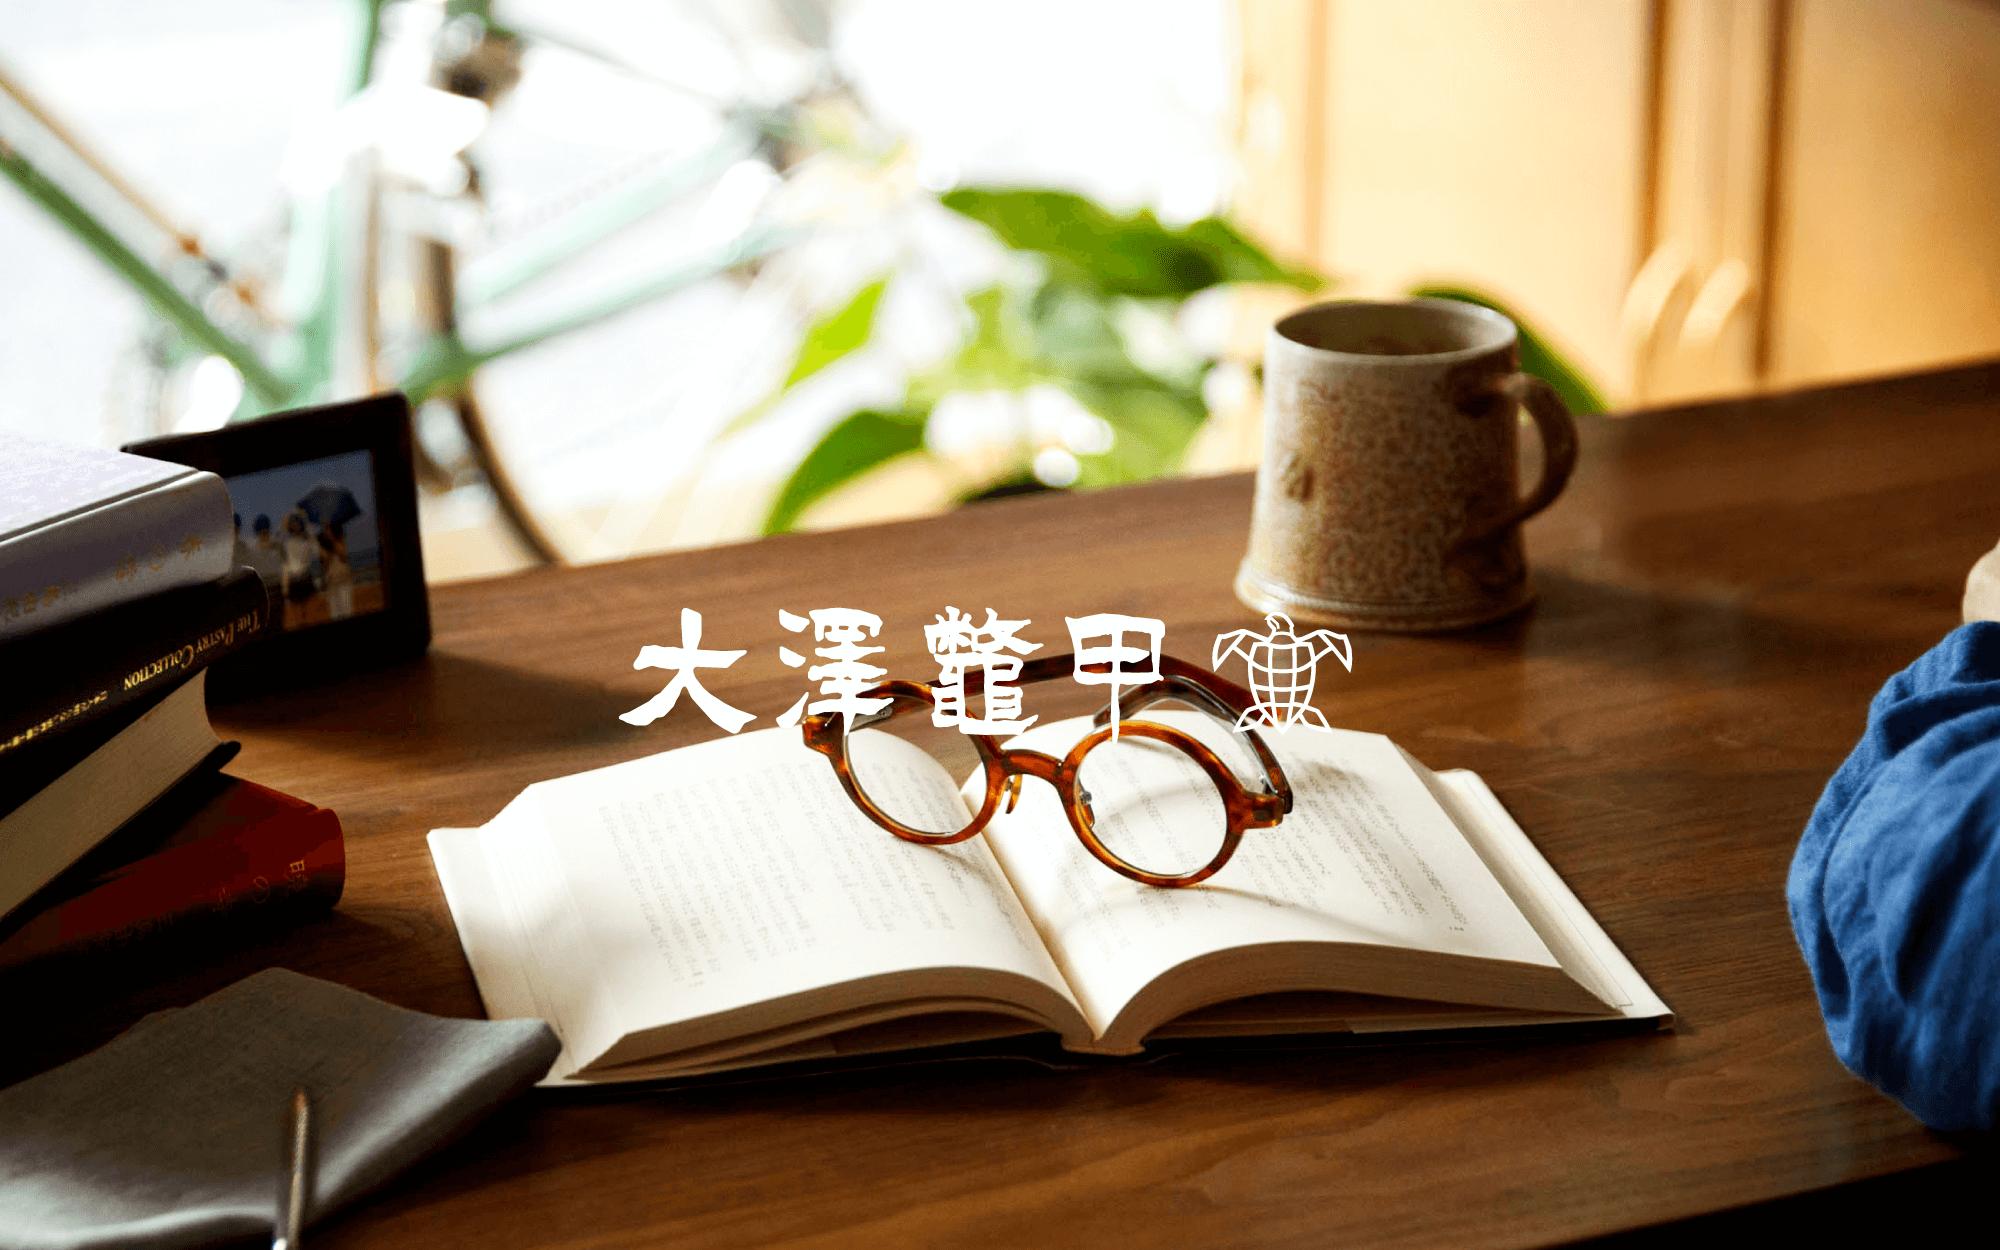 大澤鼈甲 OSAWA BEKKO